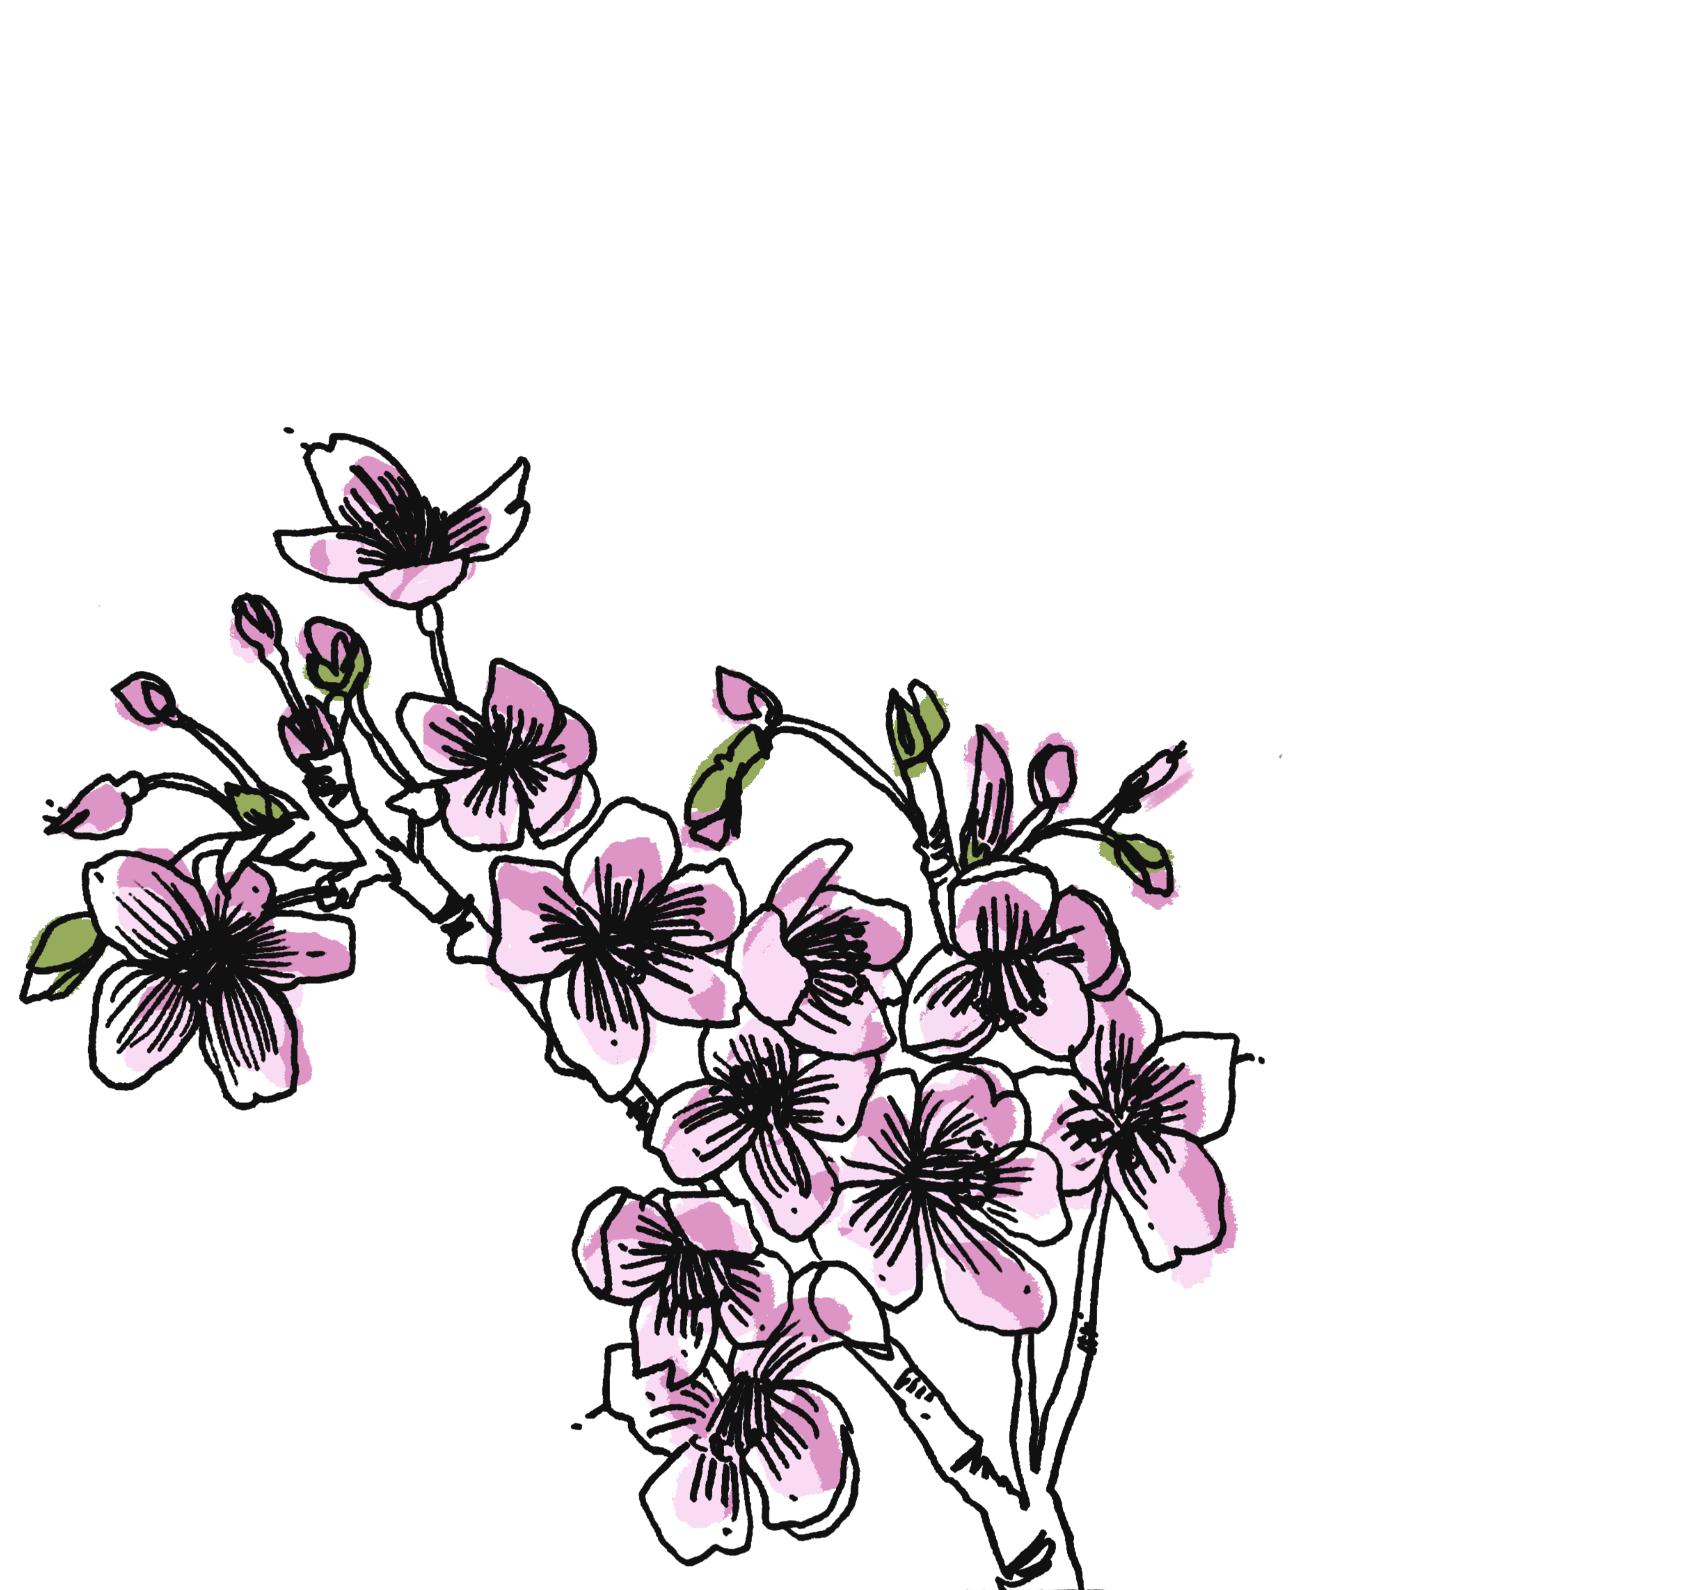 cherryblossumillustration.png